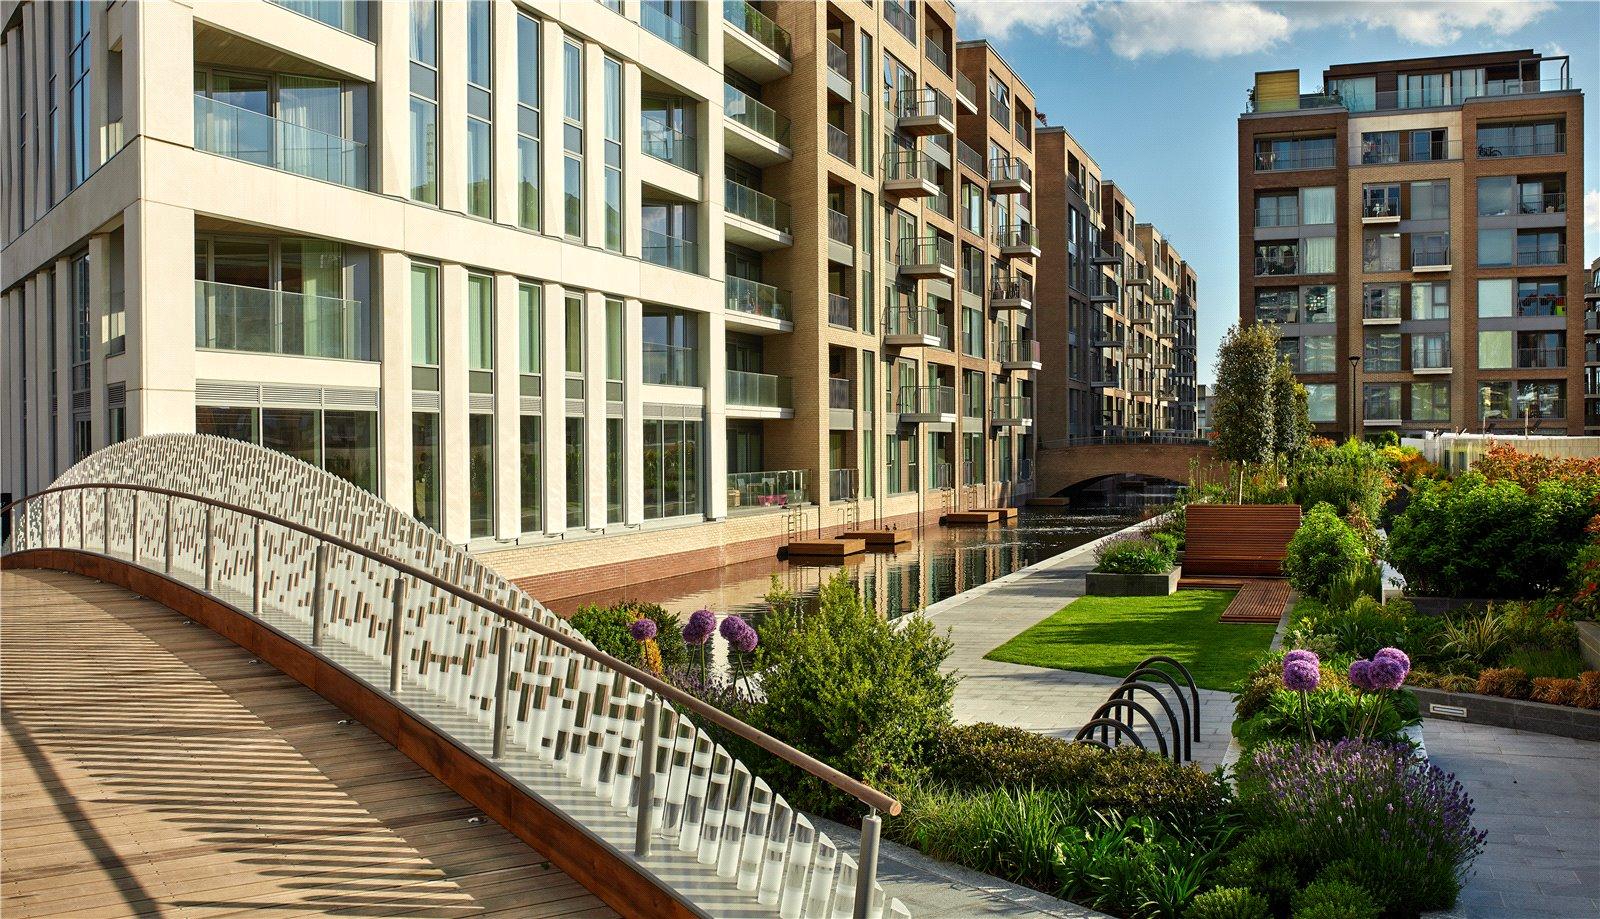 1 Bedroom Apartments For Sale Chelsea Creek Chelsea London Sw6